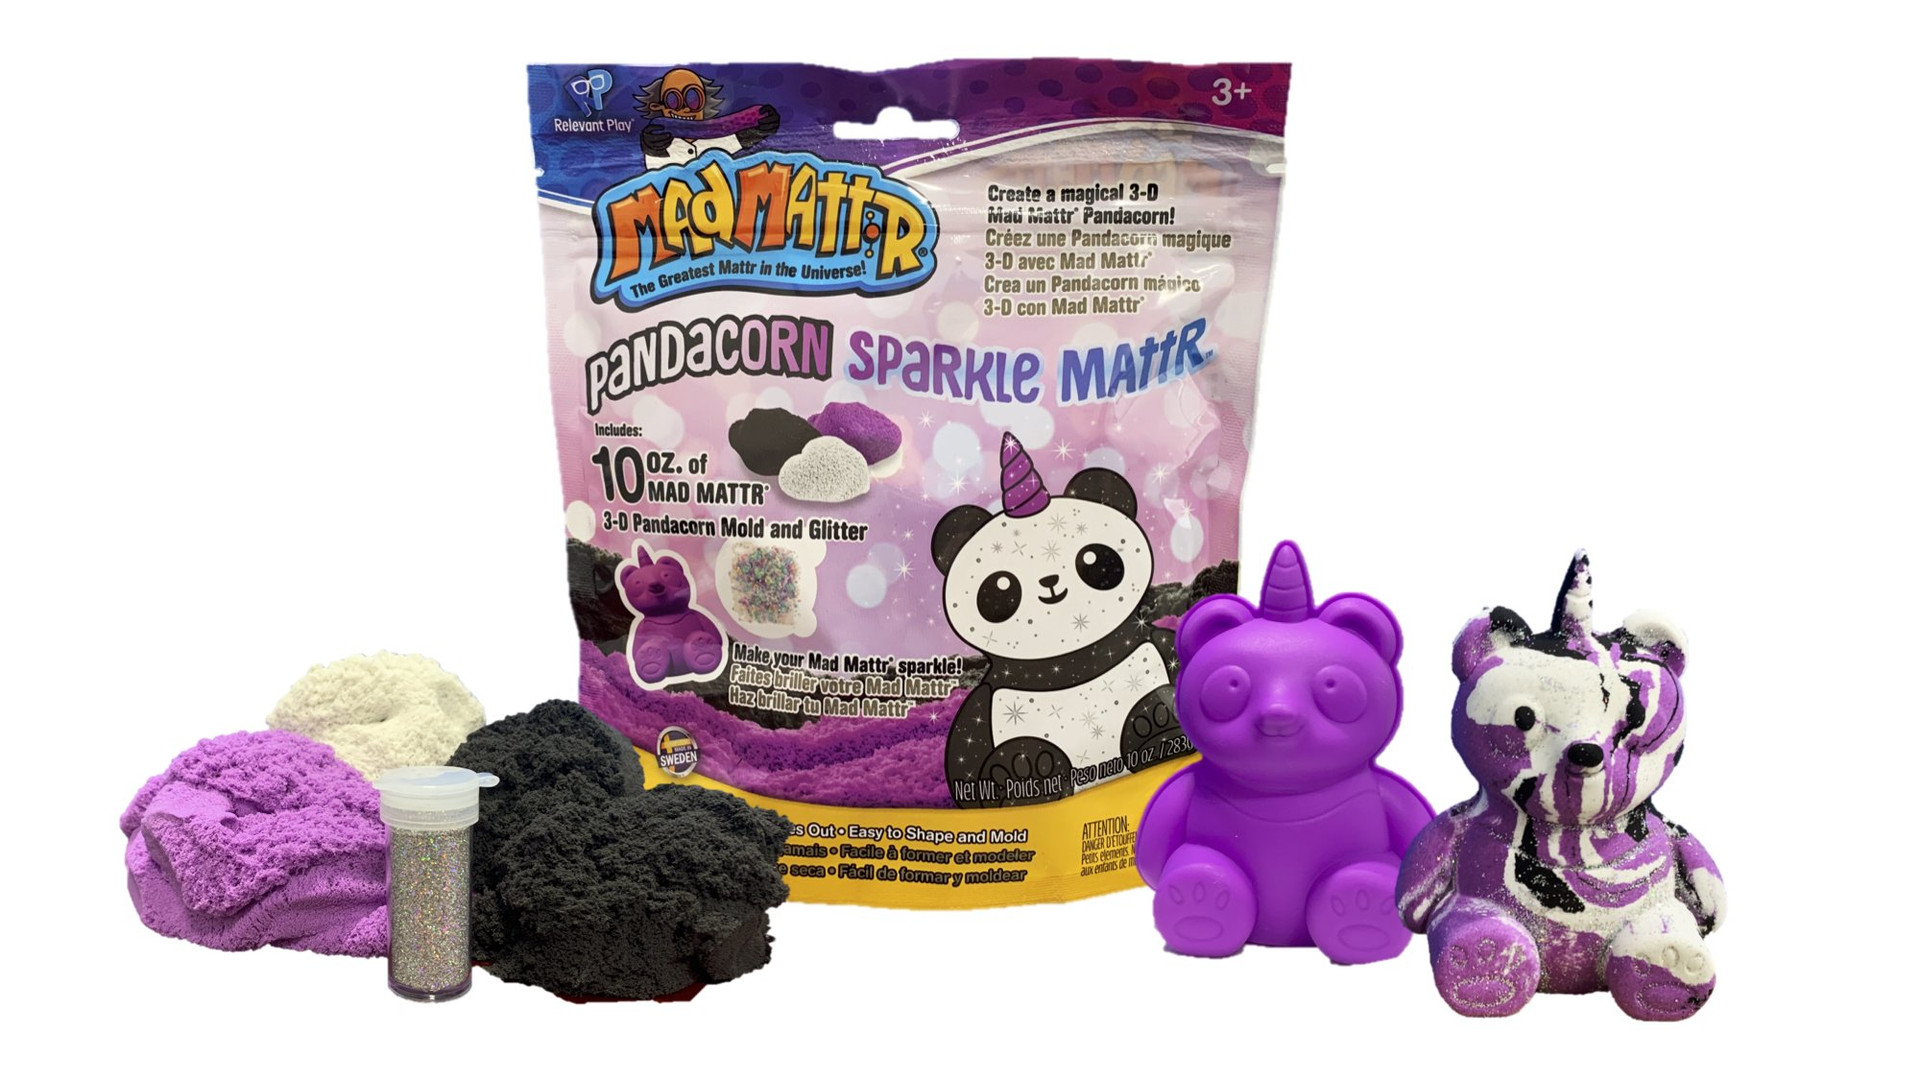 PandacornSparkleMattrfinalmoldcopy_1024x